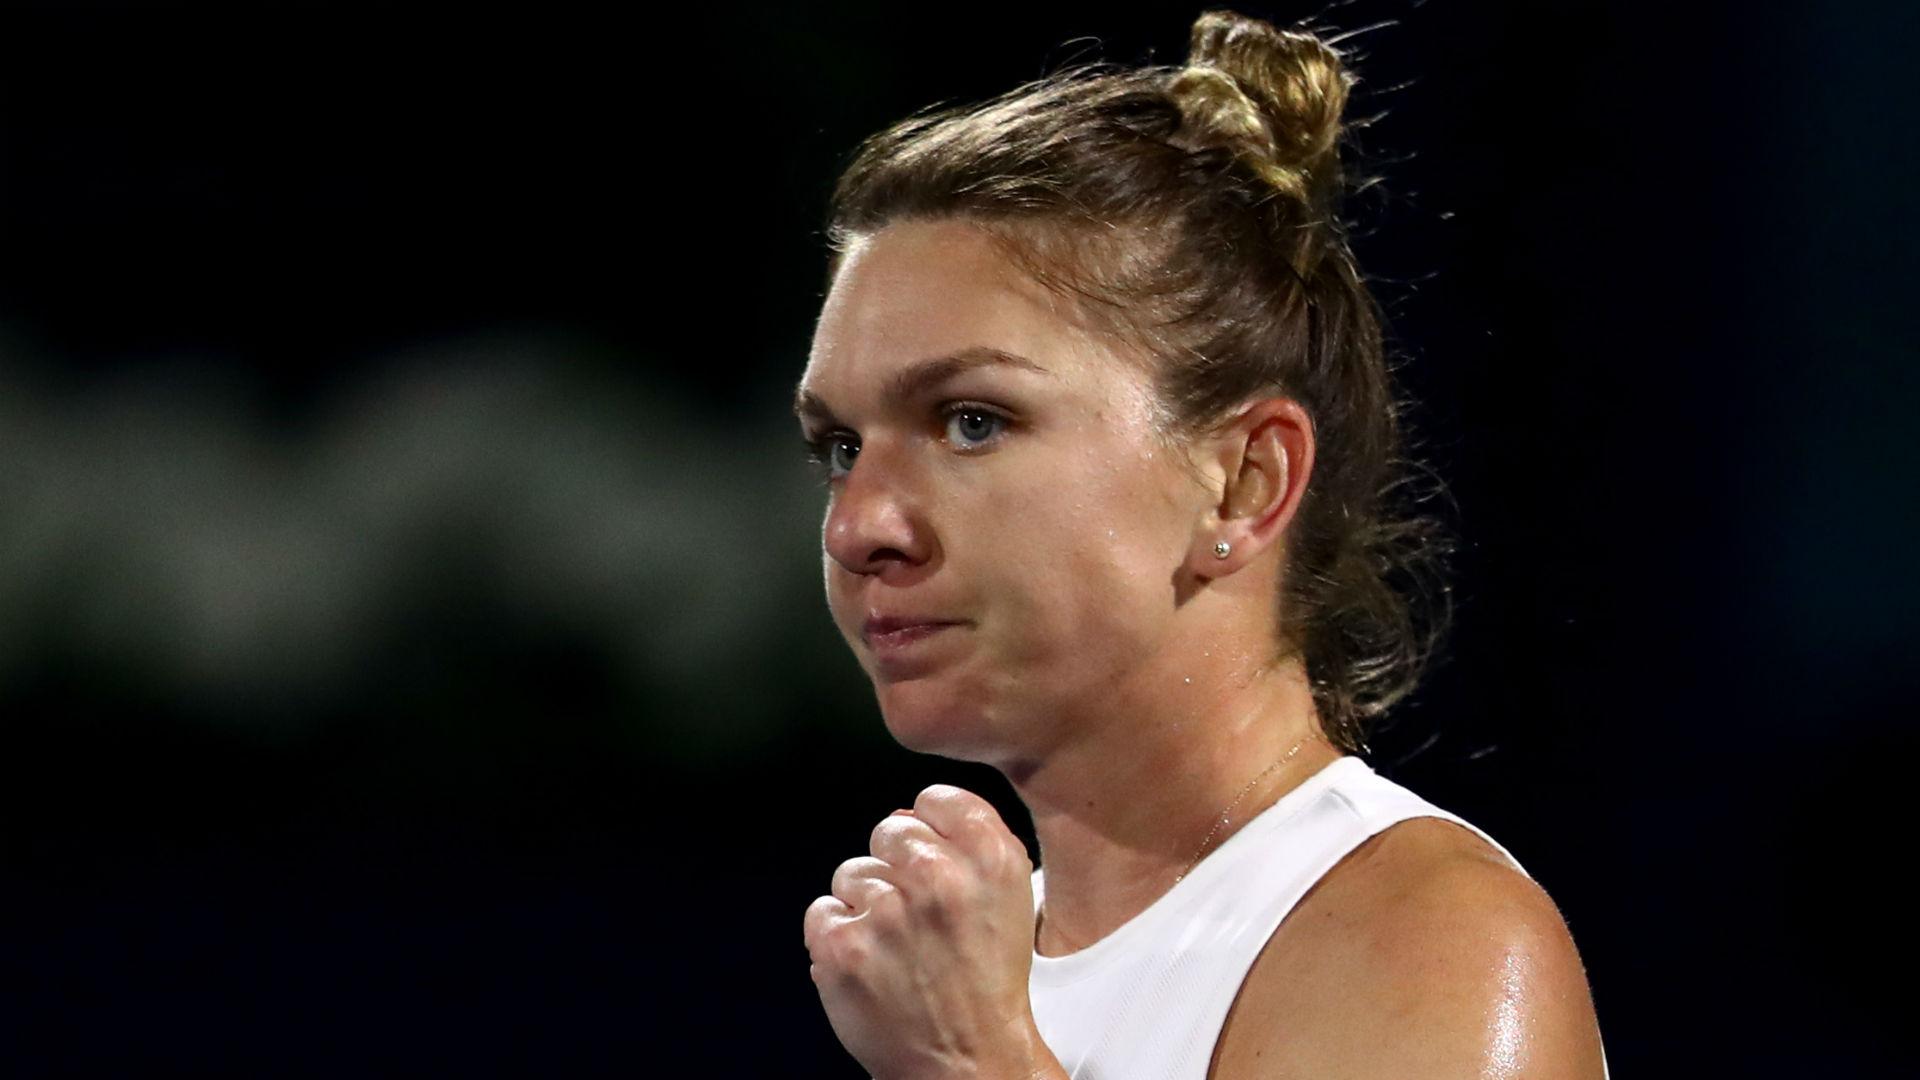 Halep outlasts Rybakina to clinch second Dubai title